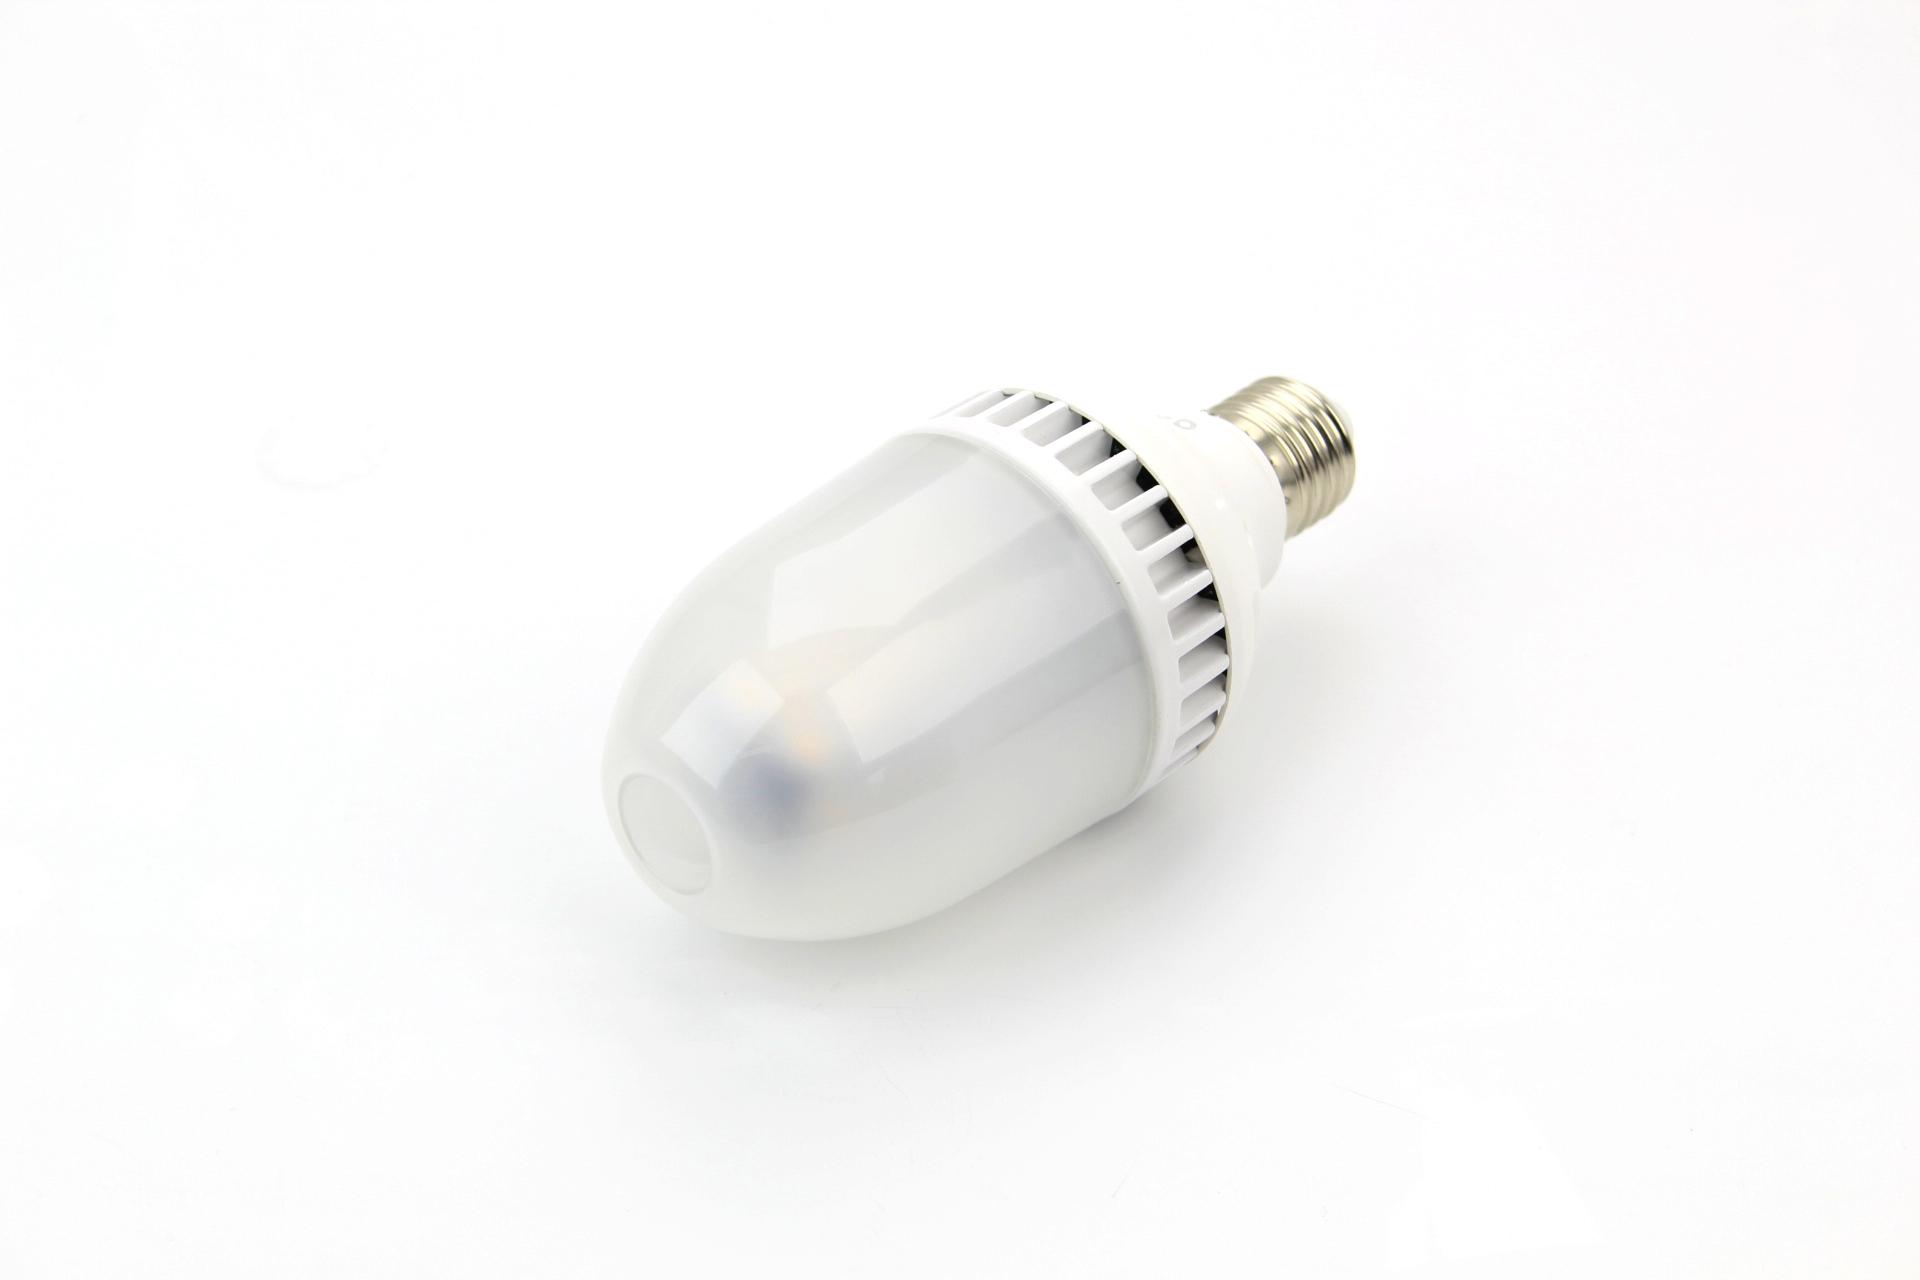 livraison gratuite ampoule beneito faure led e27 25w 230v 2700k 1980 lumens led e27 standards. Black Bedroom Furniture Sets. Home Design Ideas